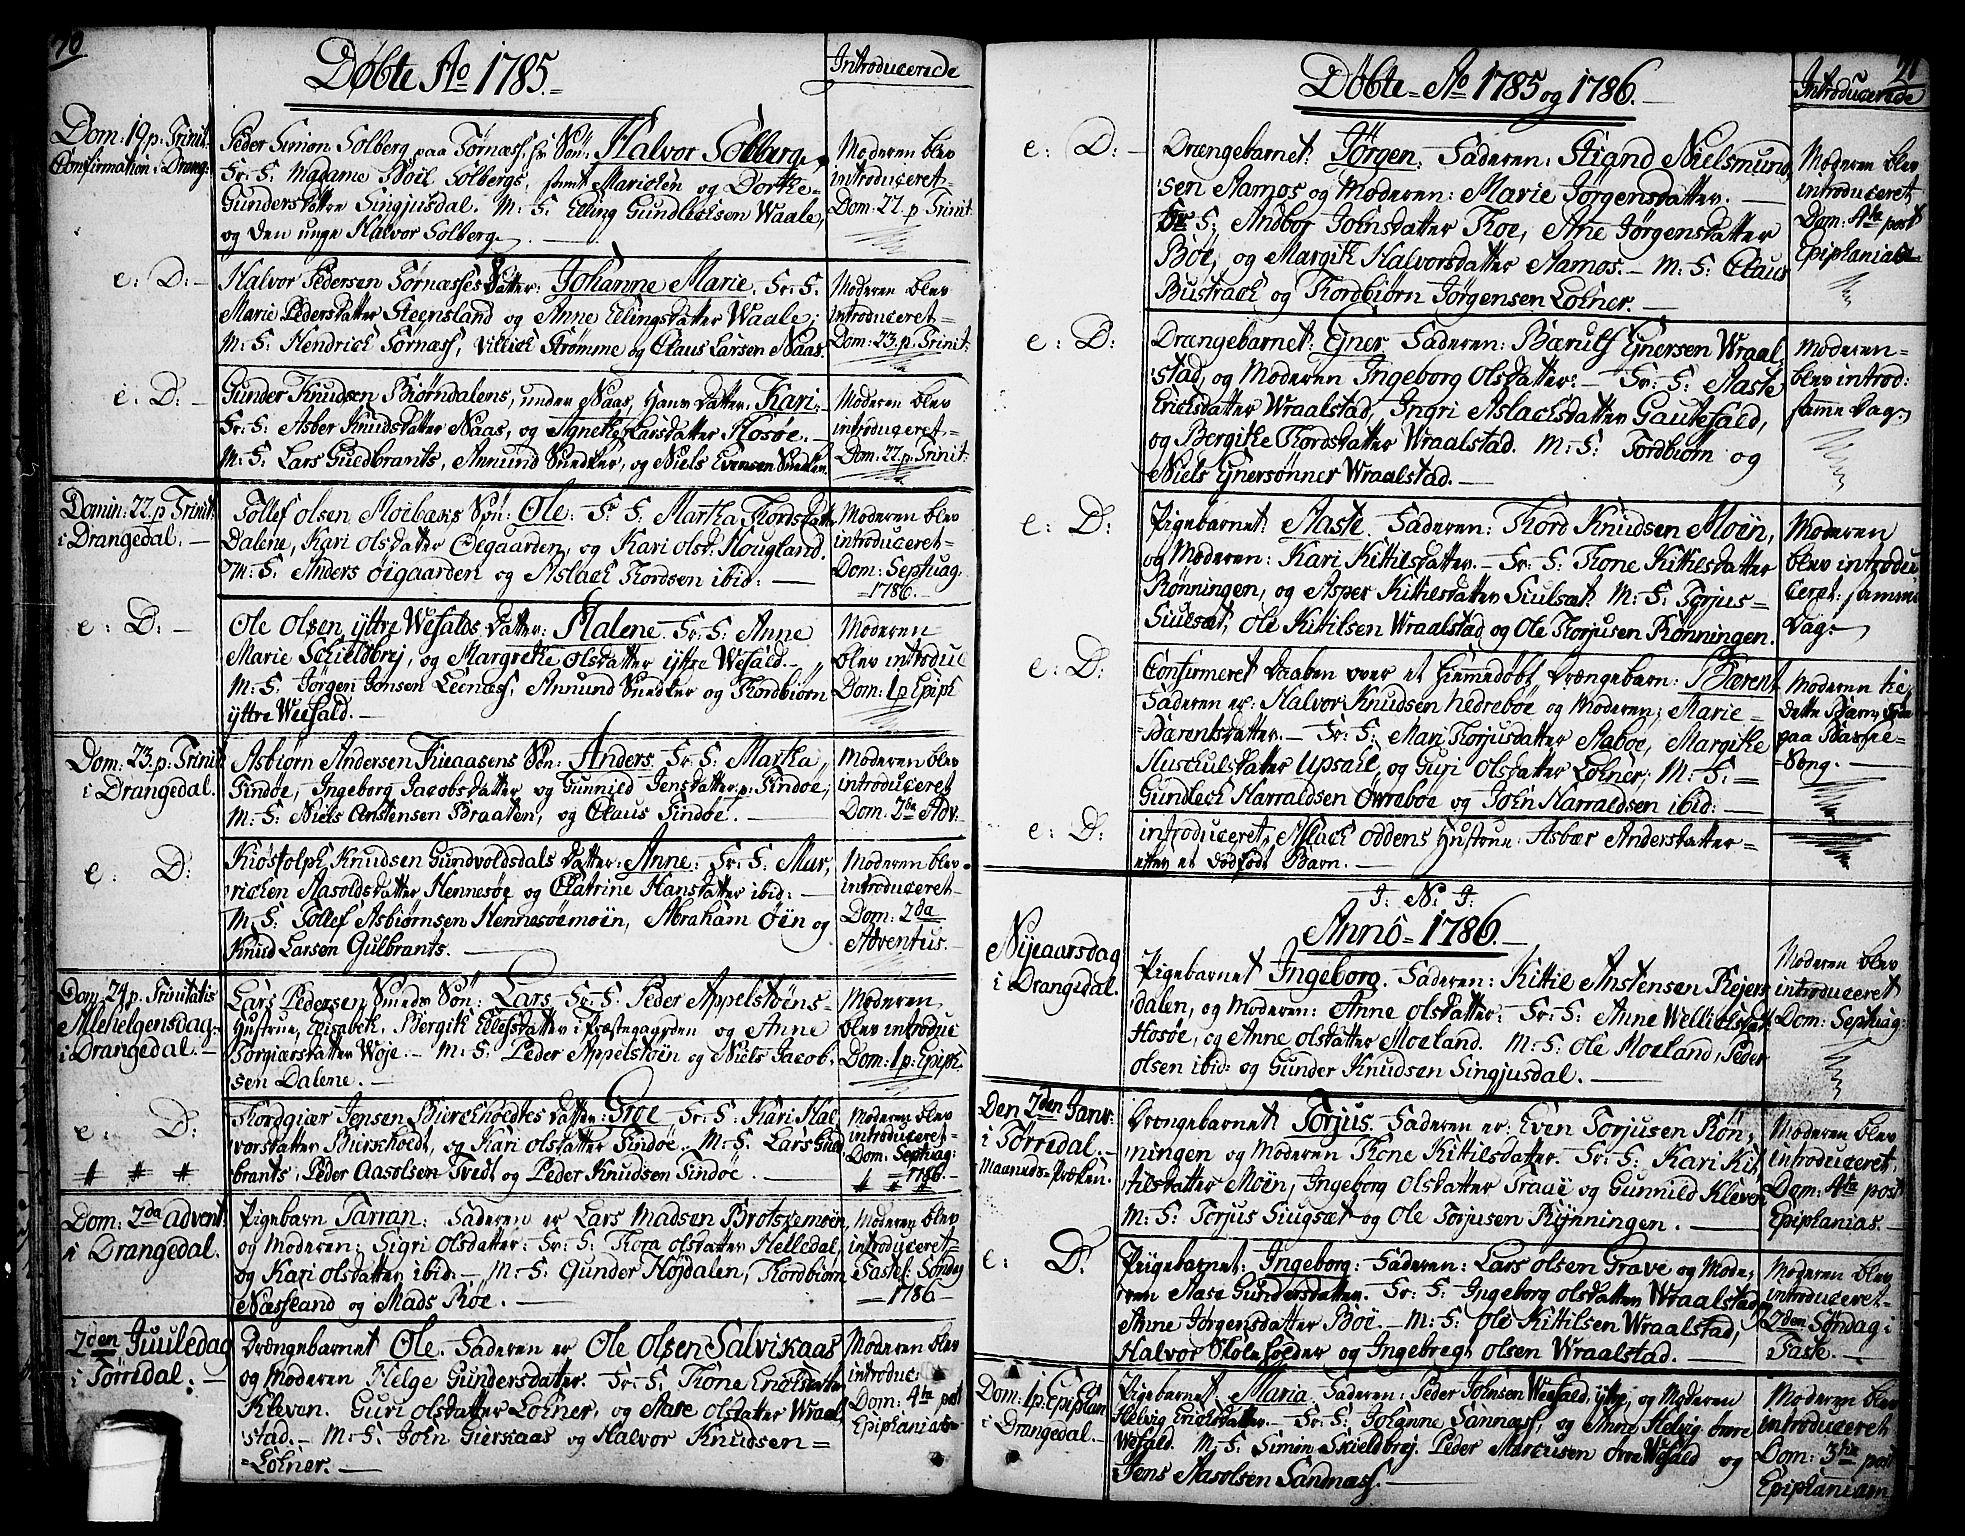 SAKO, Drangedal kirkebøker, F/Fa/L0003: Ministerialbok nr. 3, 1768-1814, s. 70-71